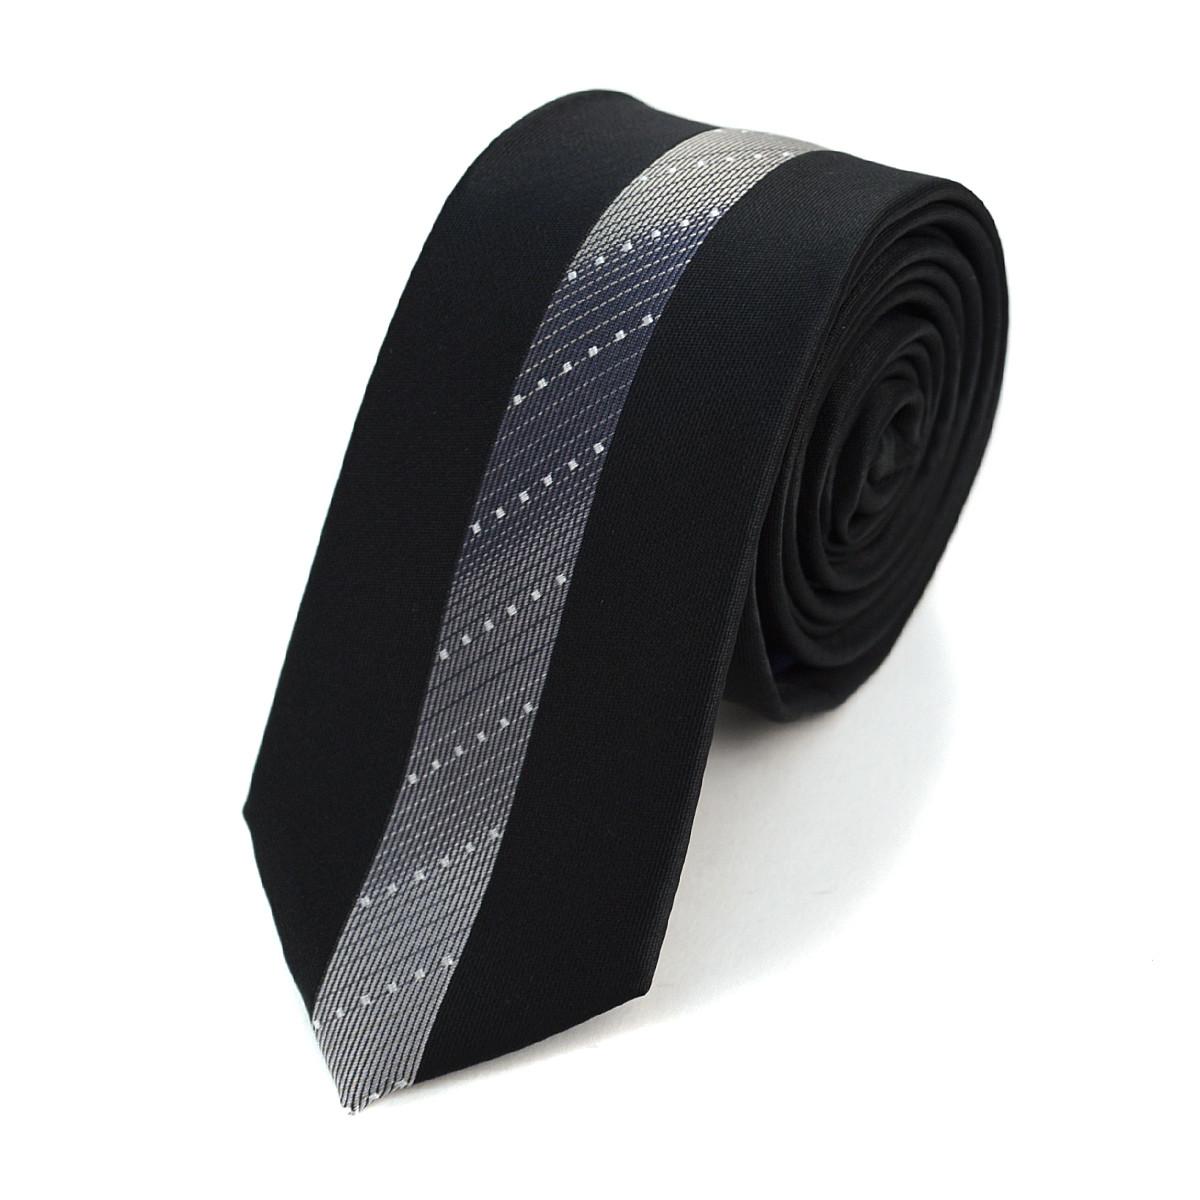 "Gradient Striped Microfiber Poly Woven 2.25"" Slim Panel Tie MPPW1619"